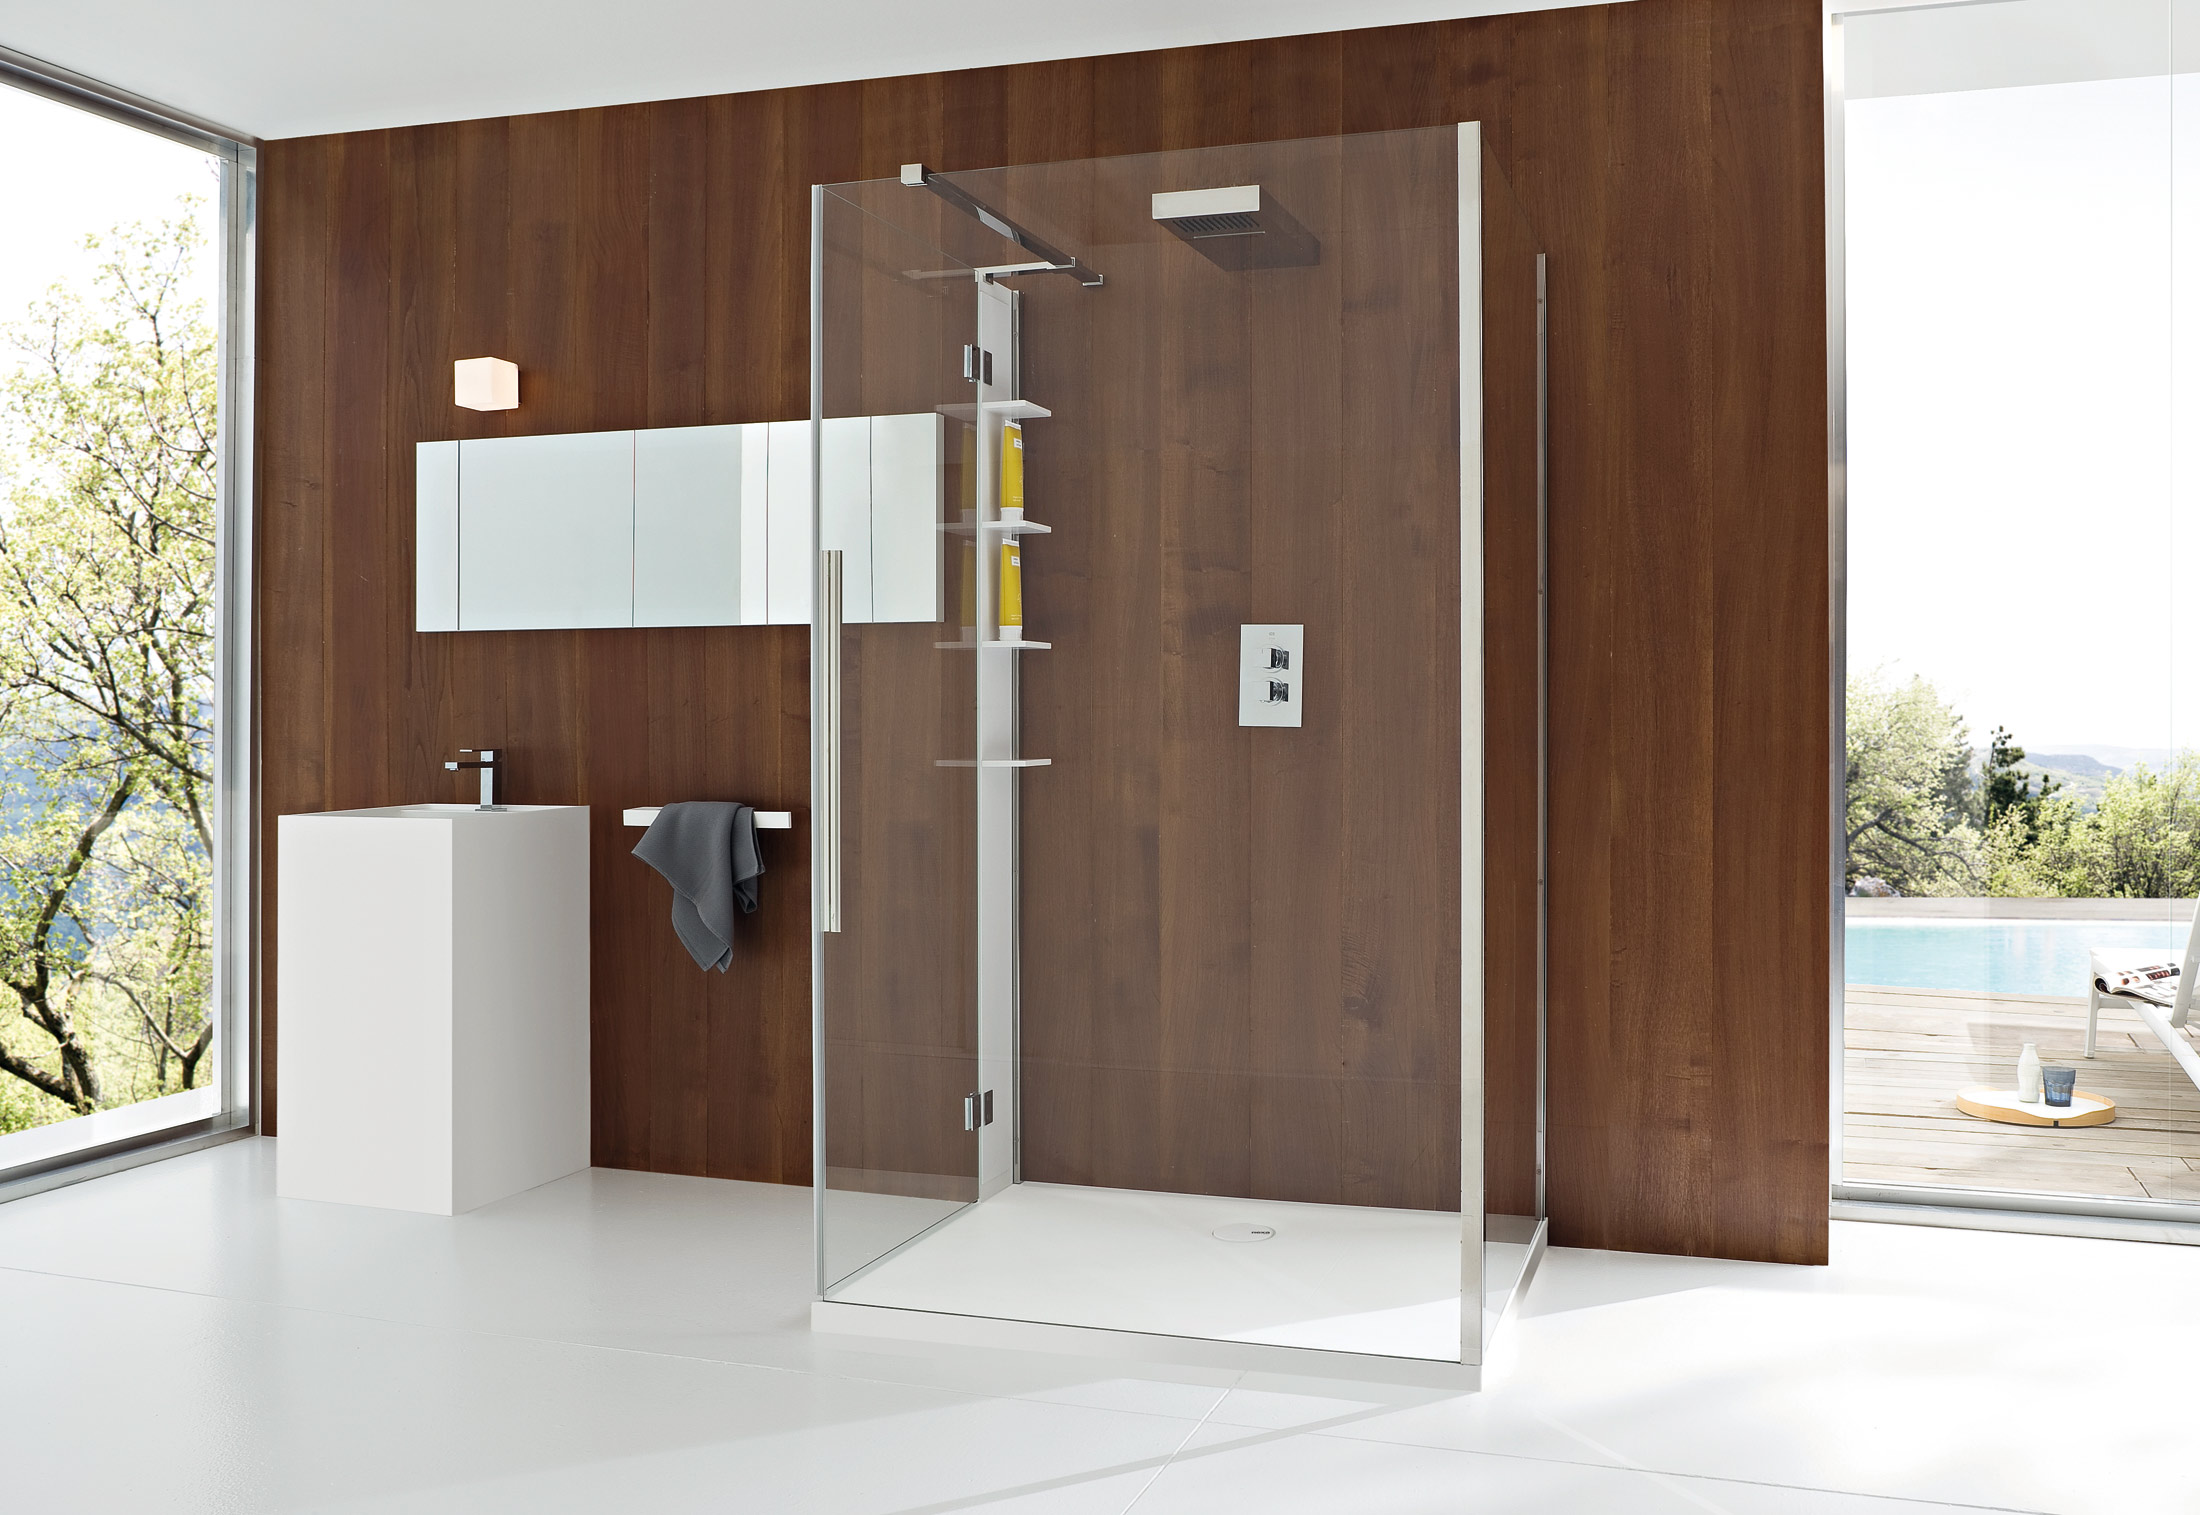 Unico shower system by Rexa Design | STYLEPARK